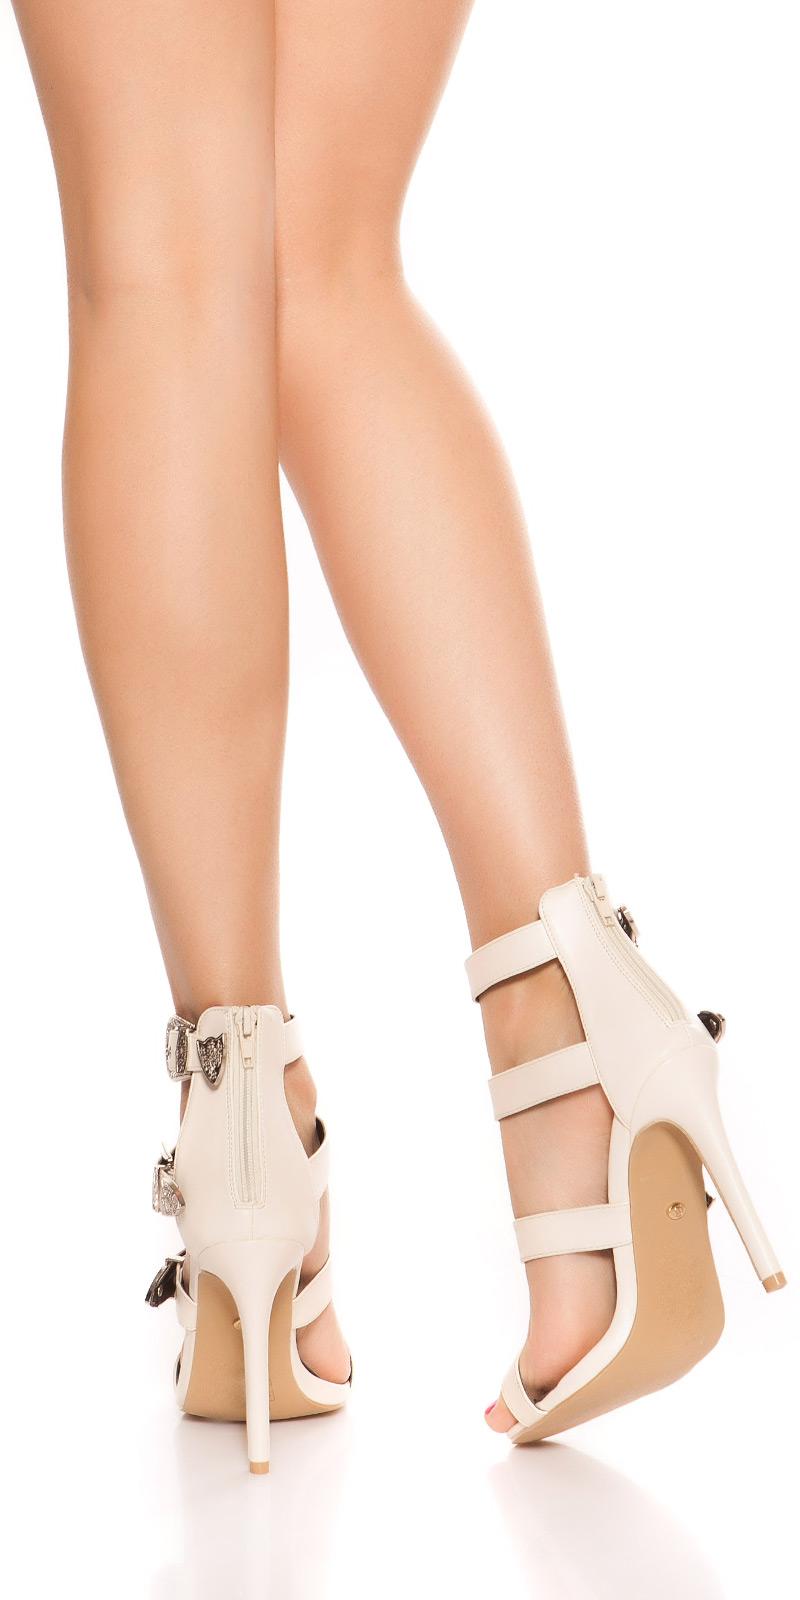 Sandale Sexy cu toc